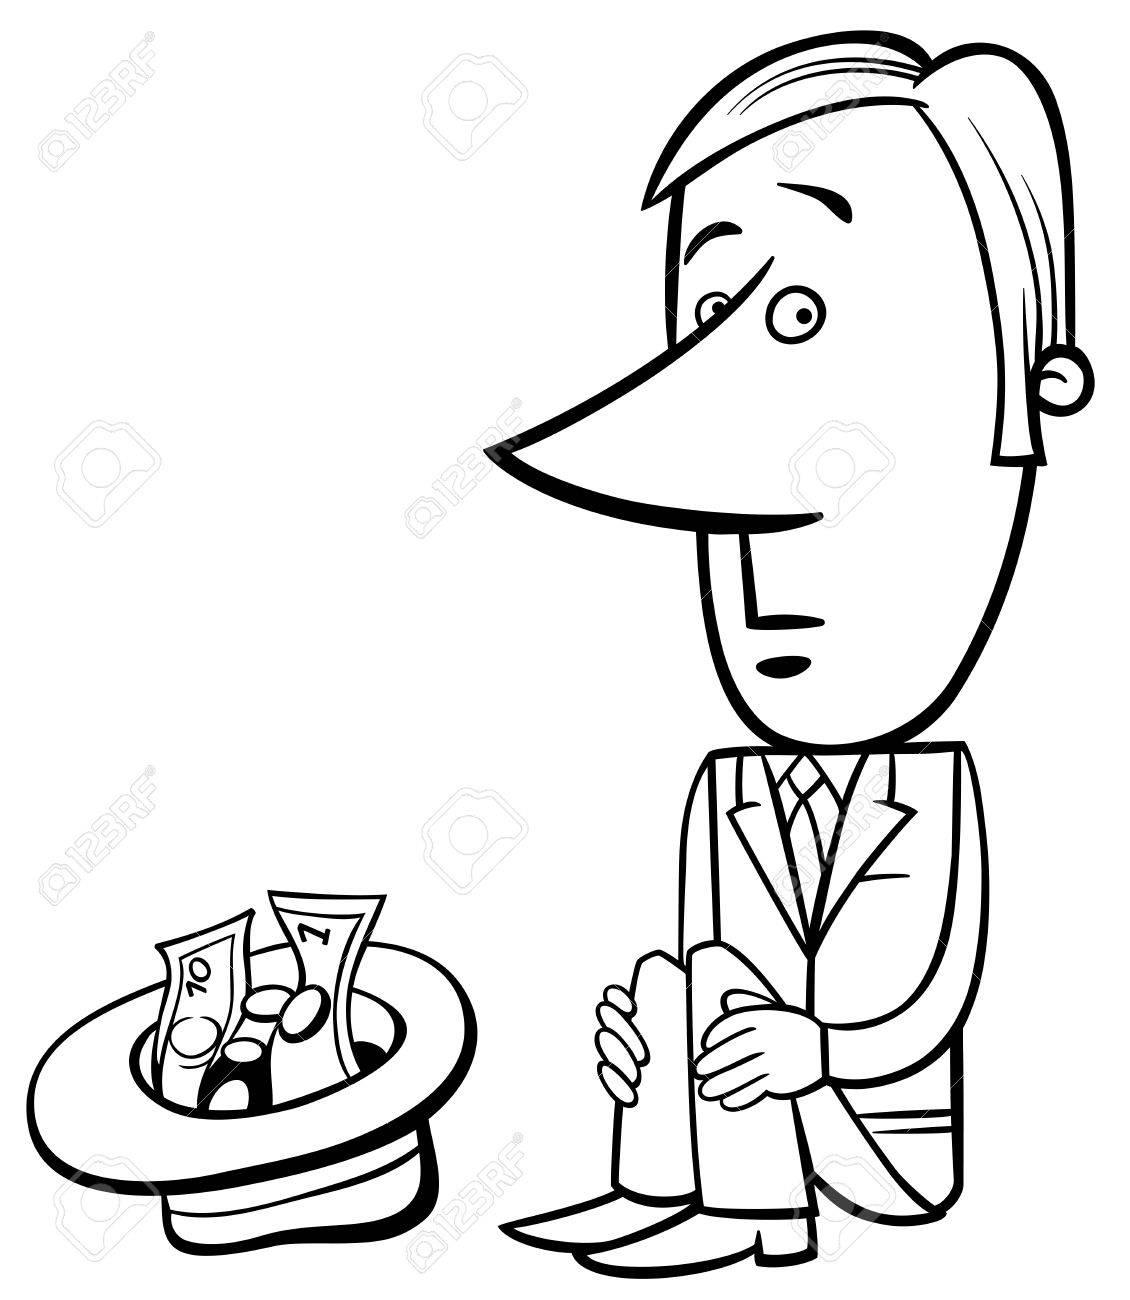 1130x1300 Black And White Concept Cartoon Illustration Of Businessman Beggar